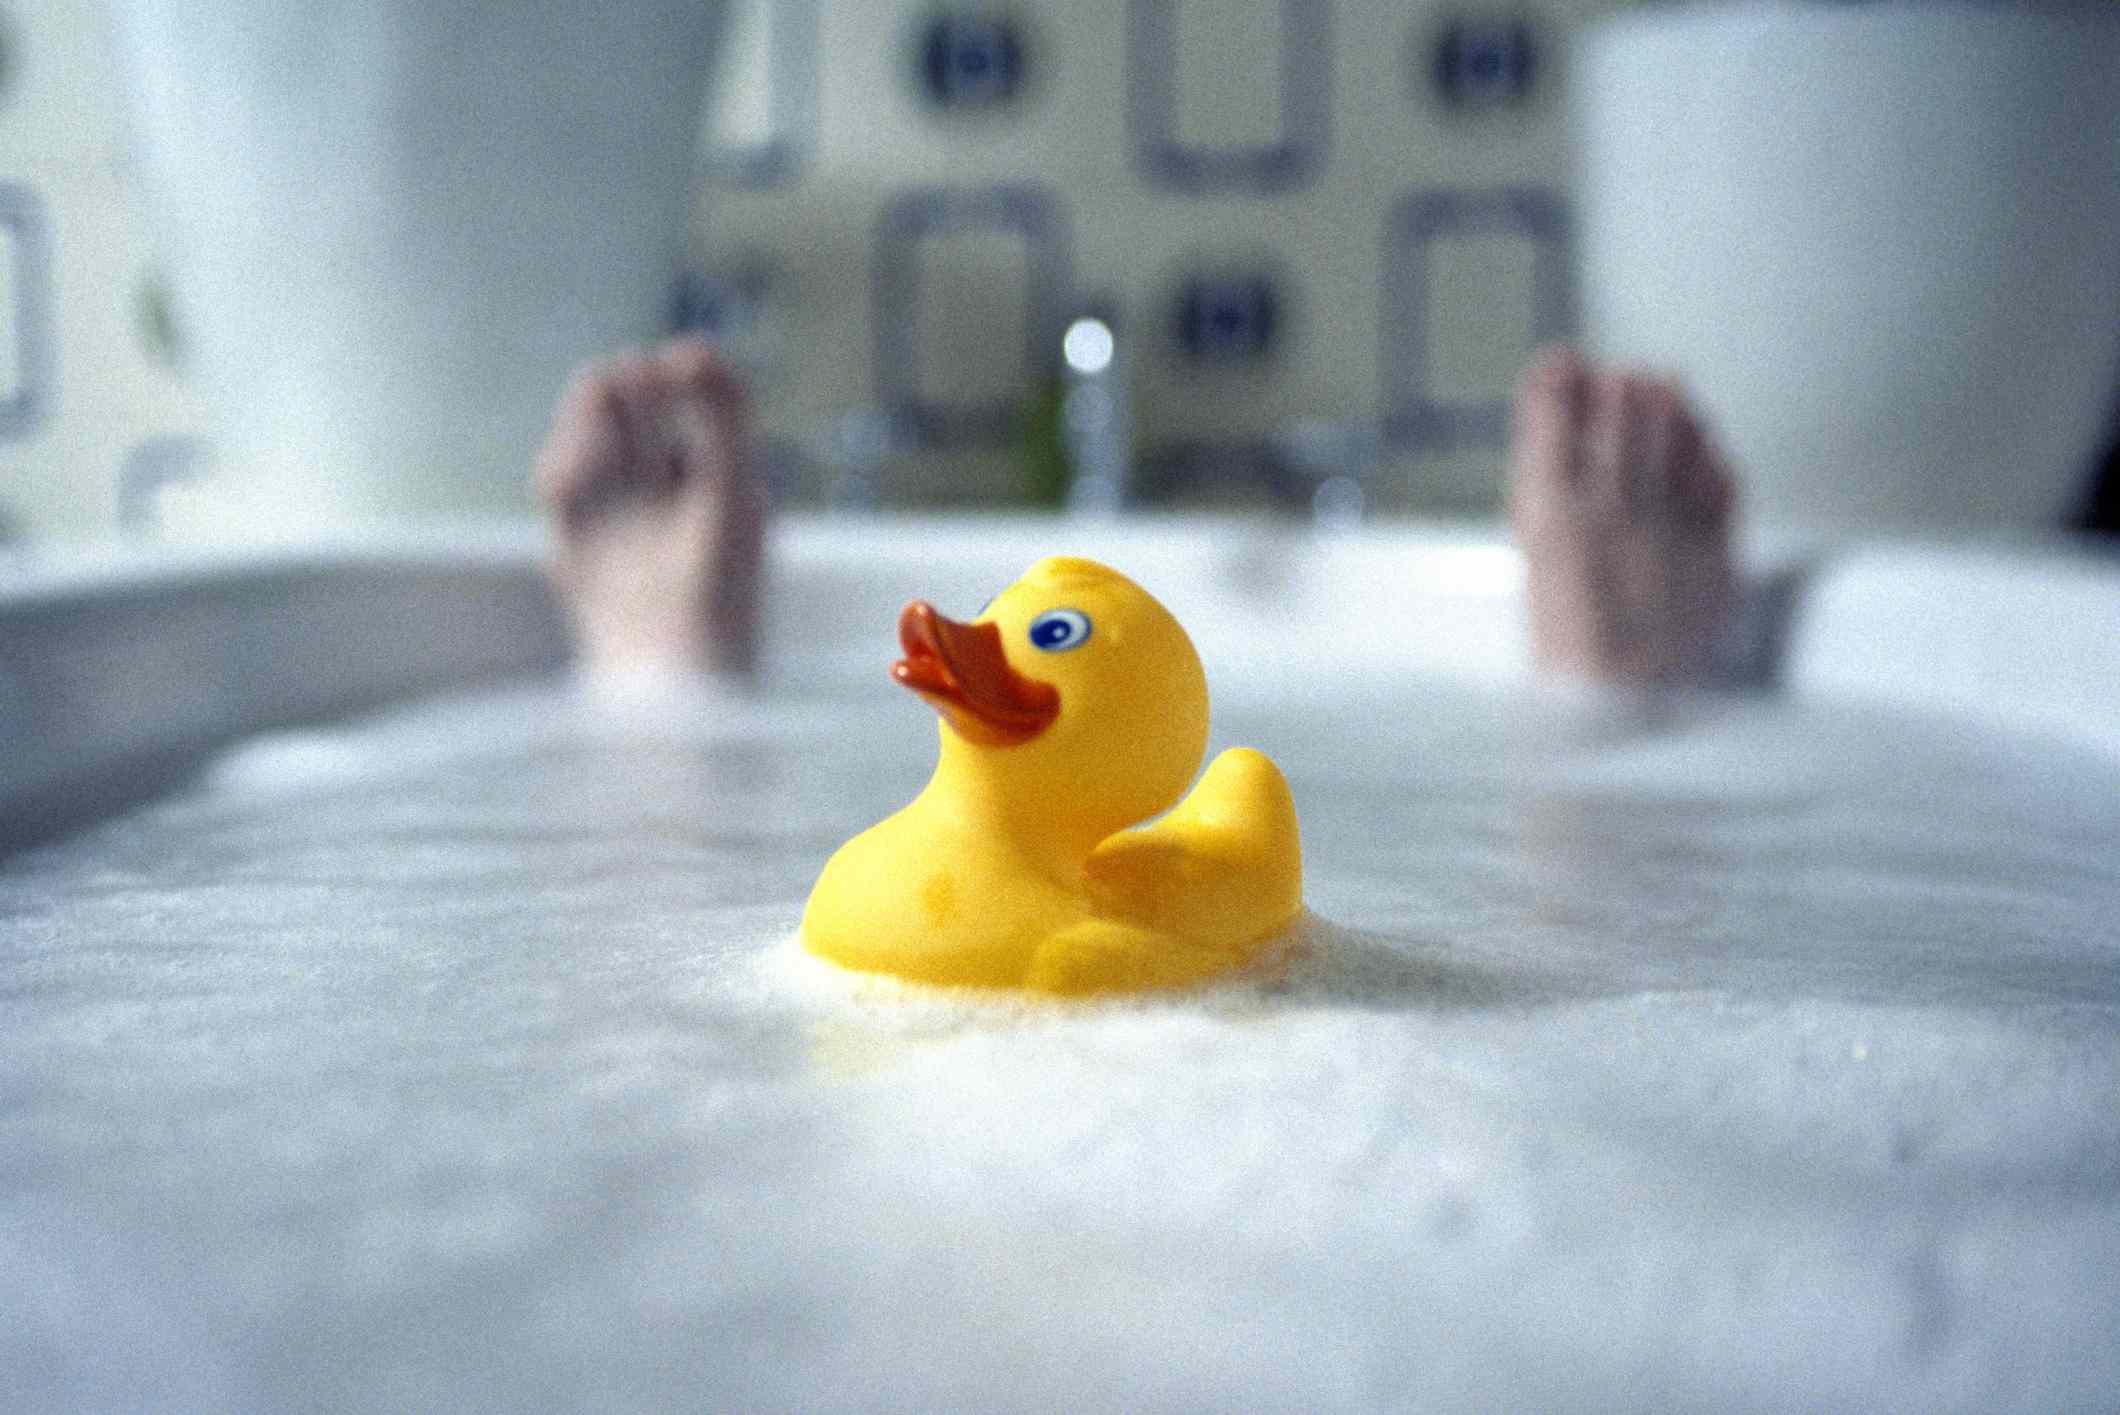 Regular Washing Will Prevent Dermatitis Neglecta